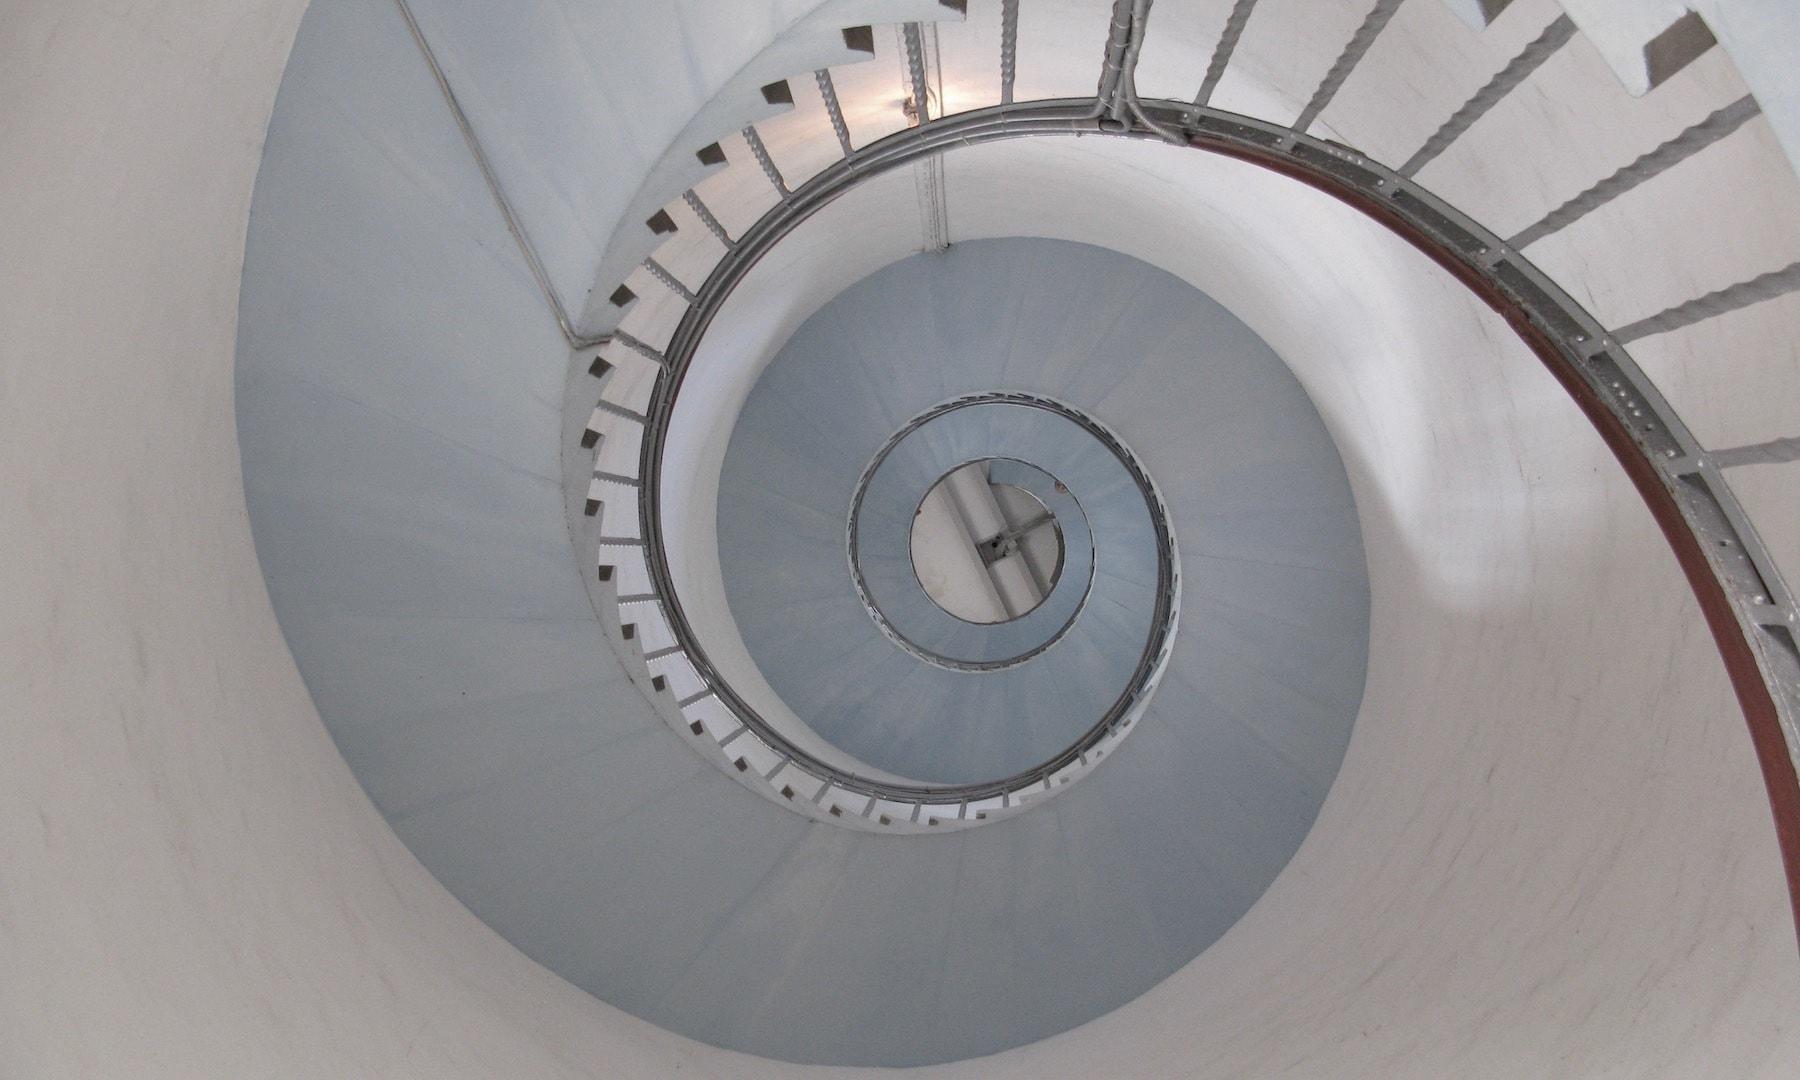 Turen op i Lyngvig Fyr går ad en trappesnegl med 228 trin